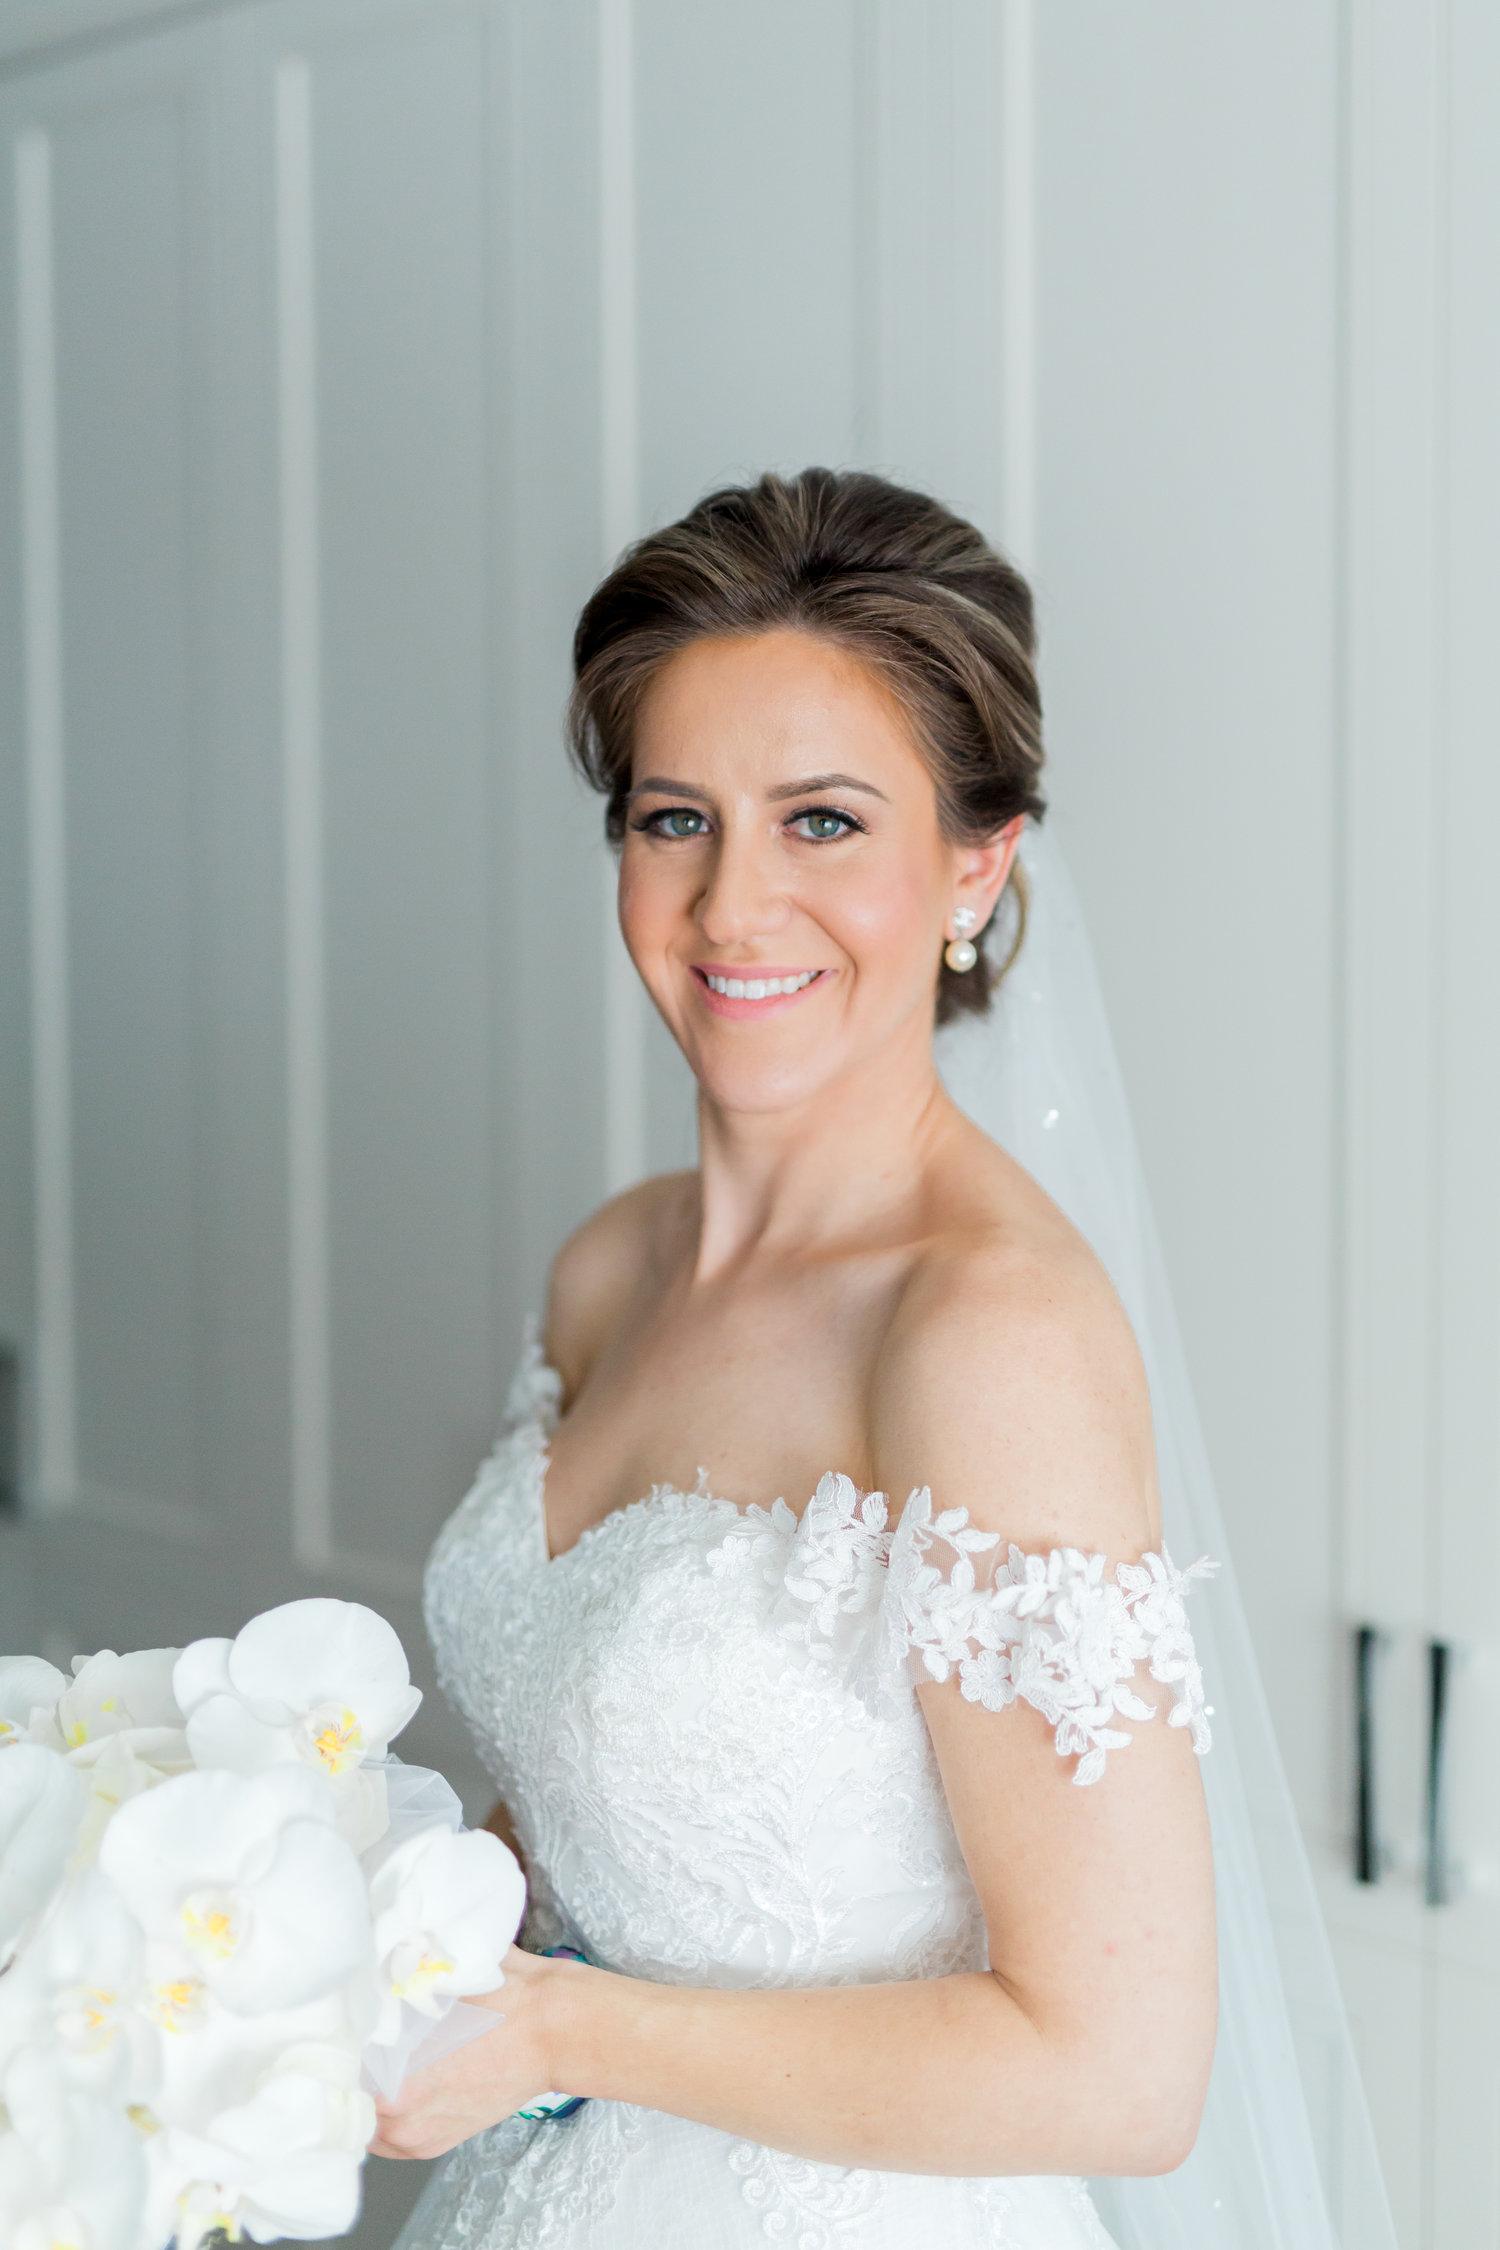 Danielle-Giroux-Amir-Golbazi-Toronto-Wedding-Photographer-Bellvue-Manor_DeLuca_1-265.jpg